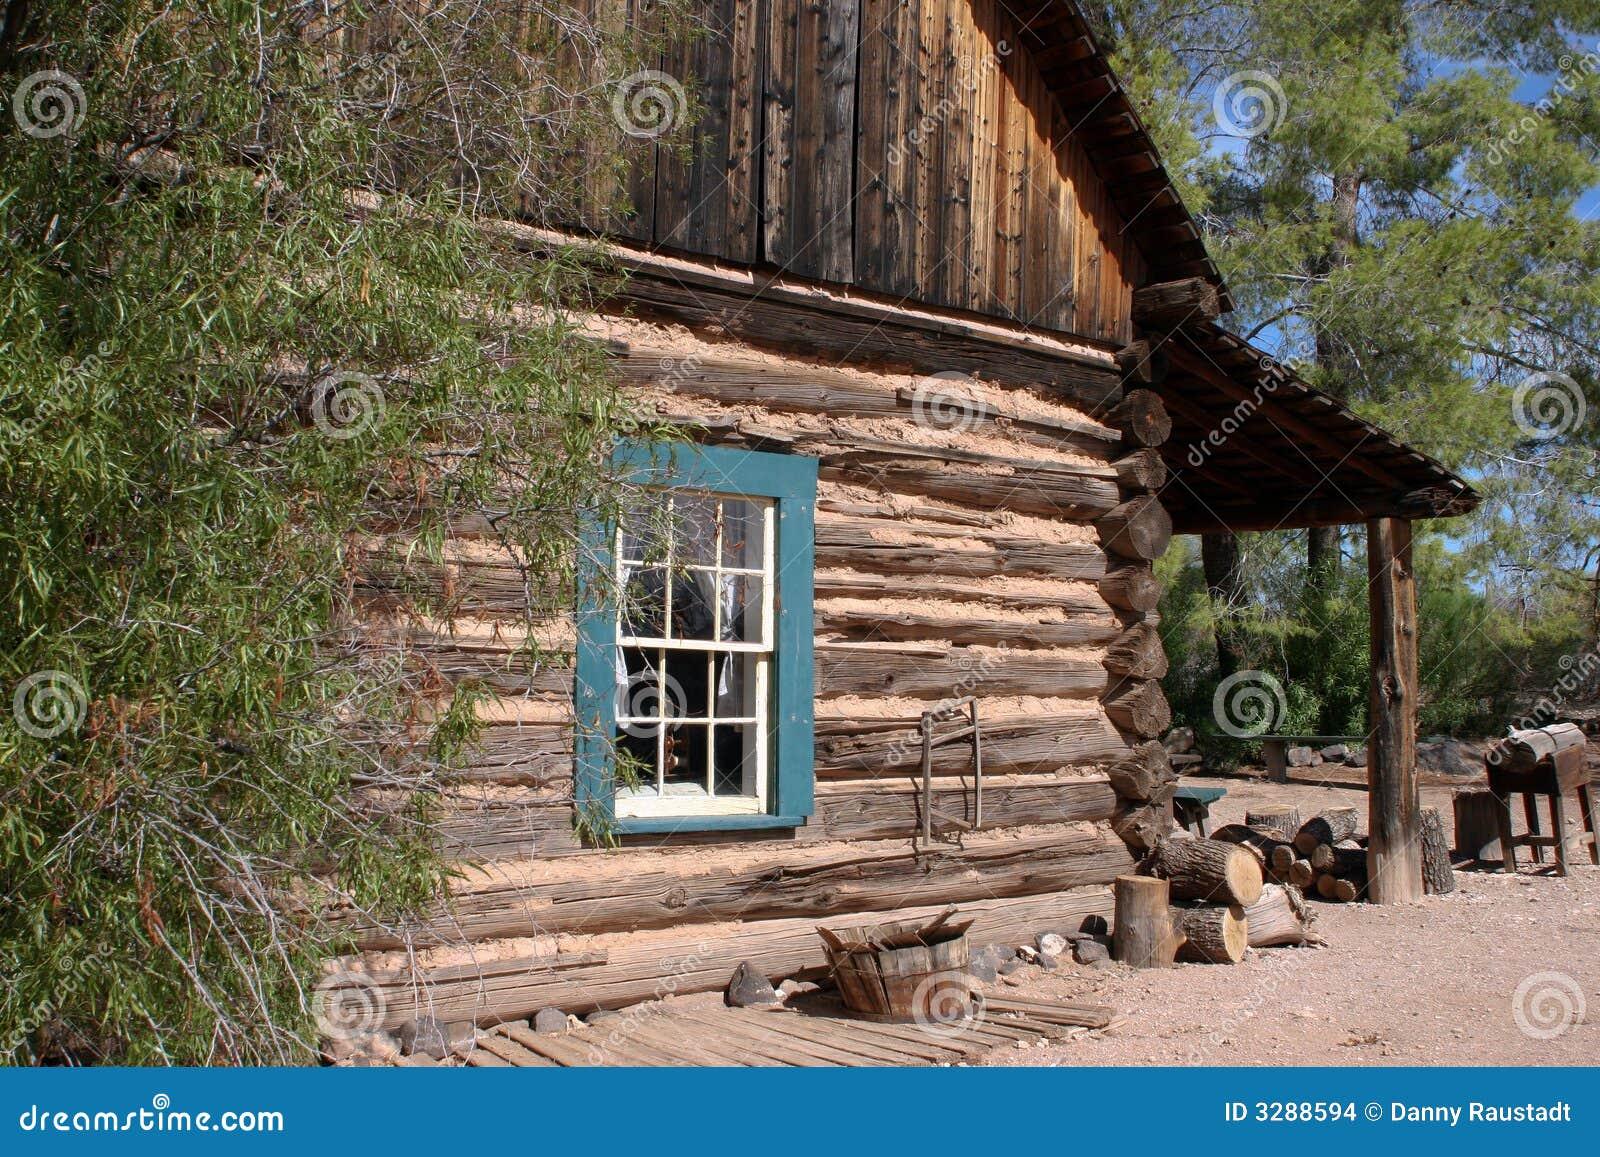 Old Western Cowboy Log Cabin Stock Images Image 3288594